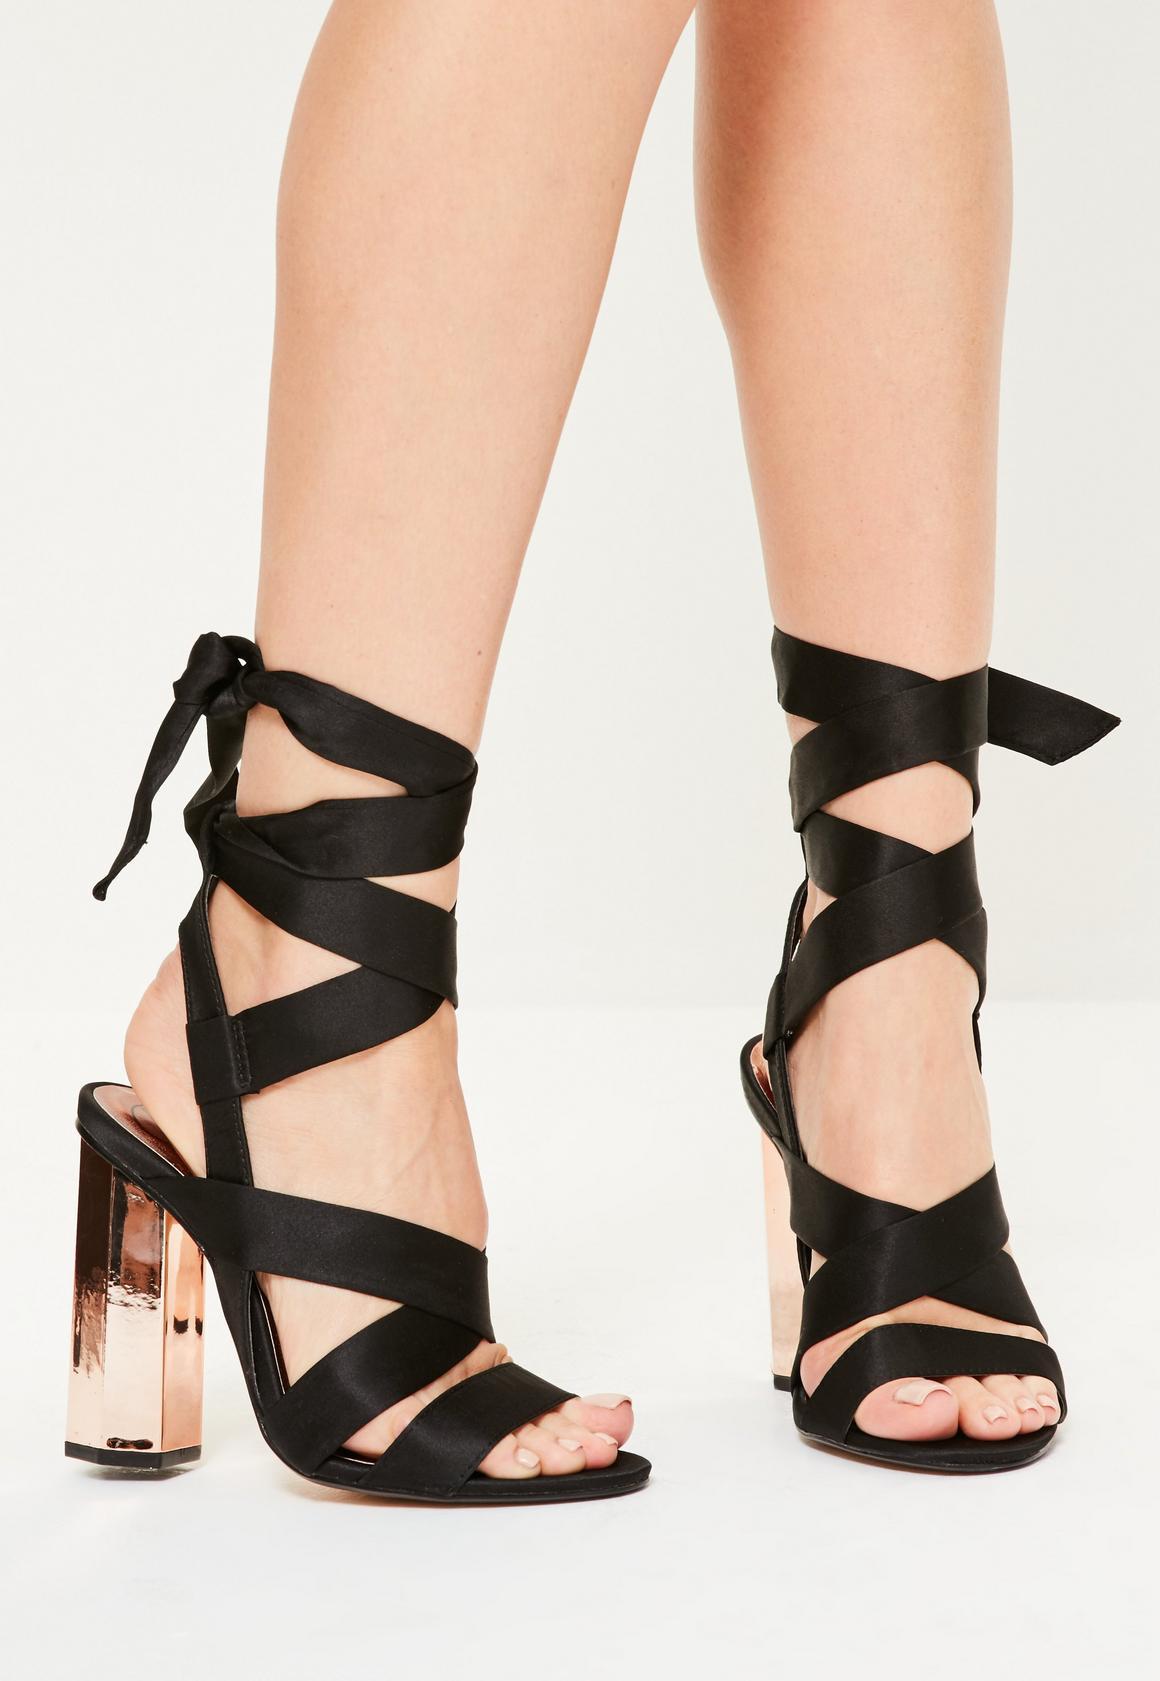 Rose Gold Satin Tie Detail Block Heeled Sandals   Missguided